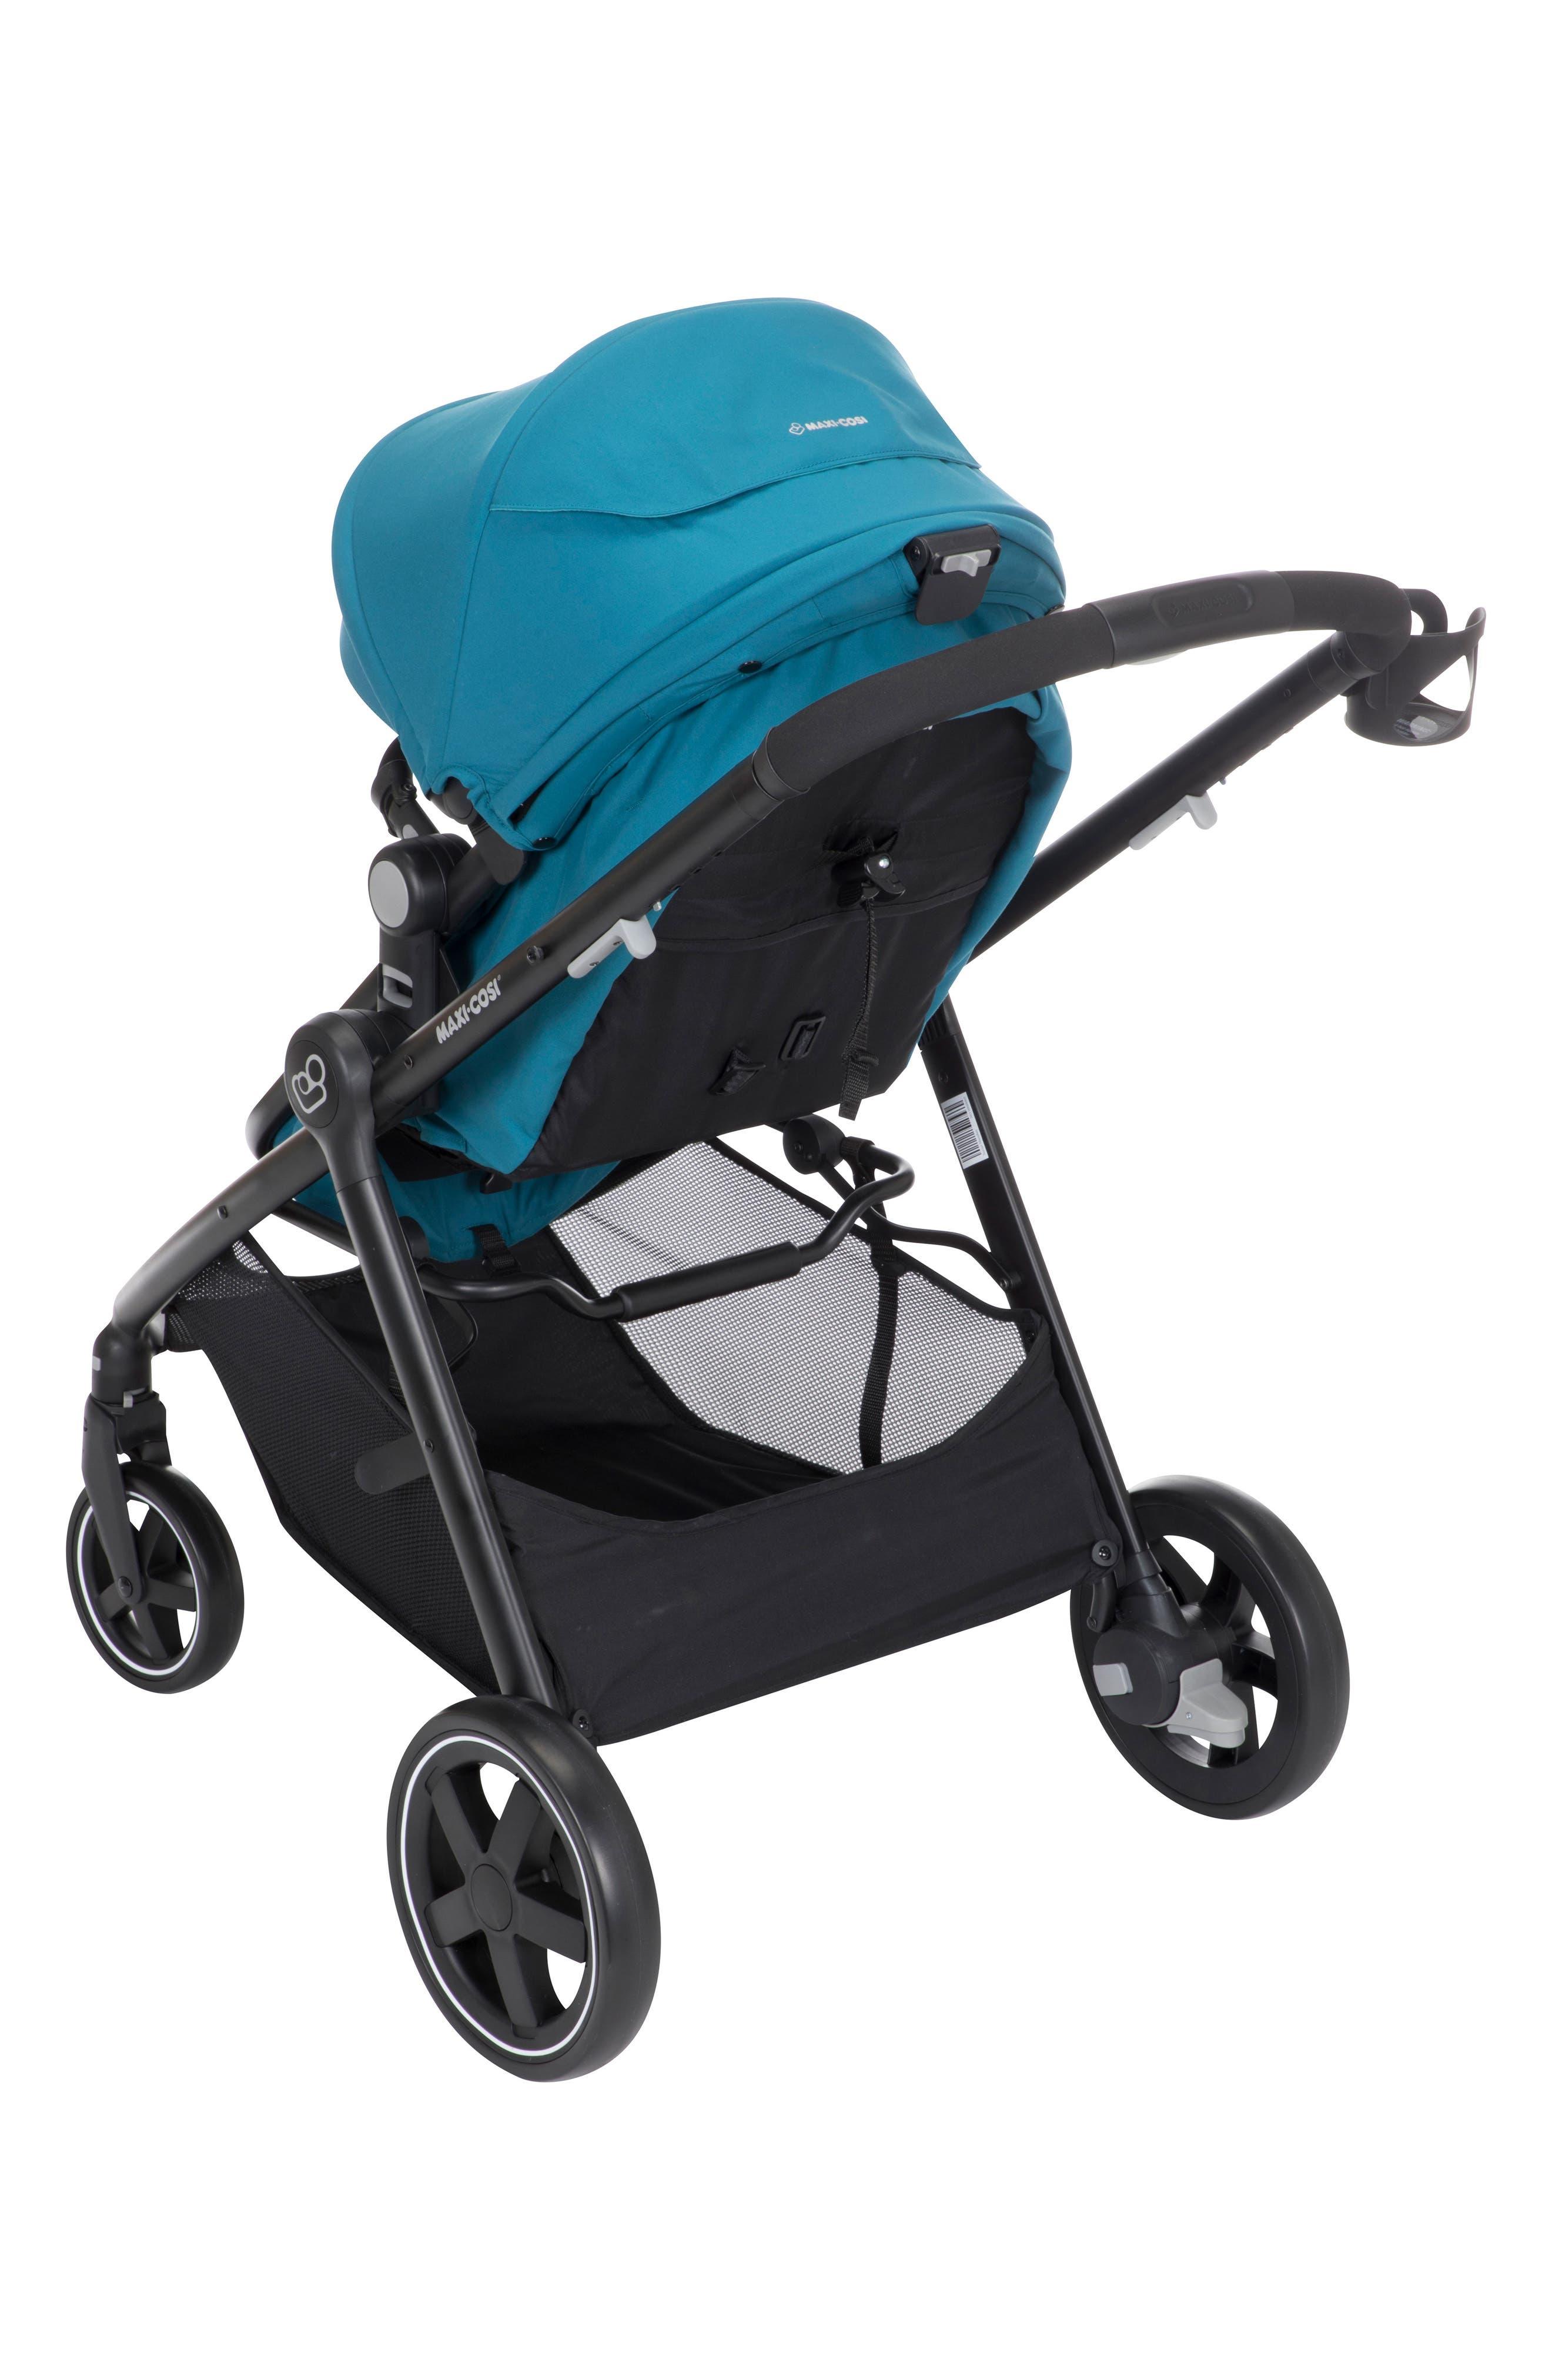 5-1 Mico 30 Infant Car Seat & Zelia Stroller Modular Travel System,                             Alternate thumbnail 7, color,                             EMERALD TIDE